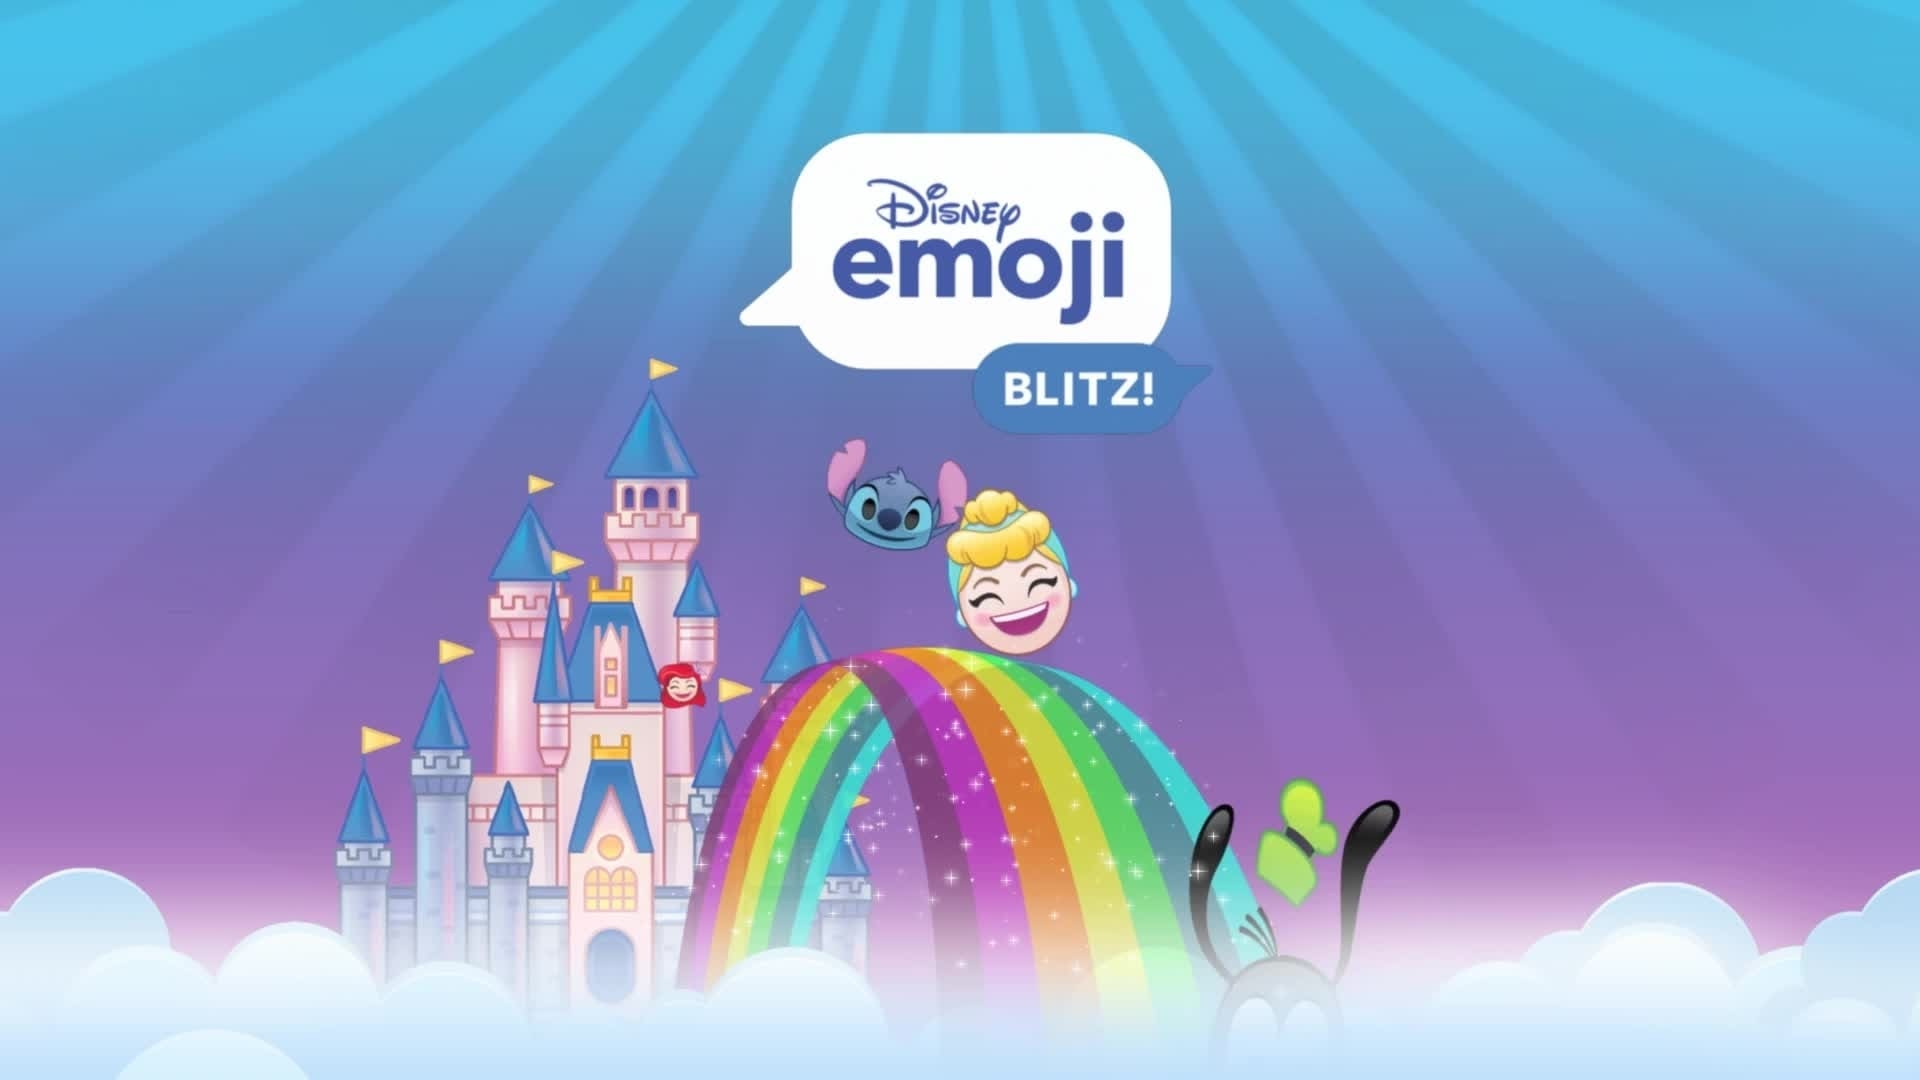 Disney Emoji Blitz! App Trailer